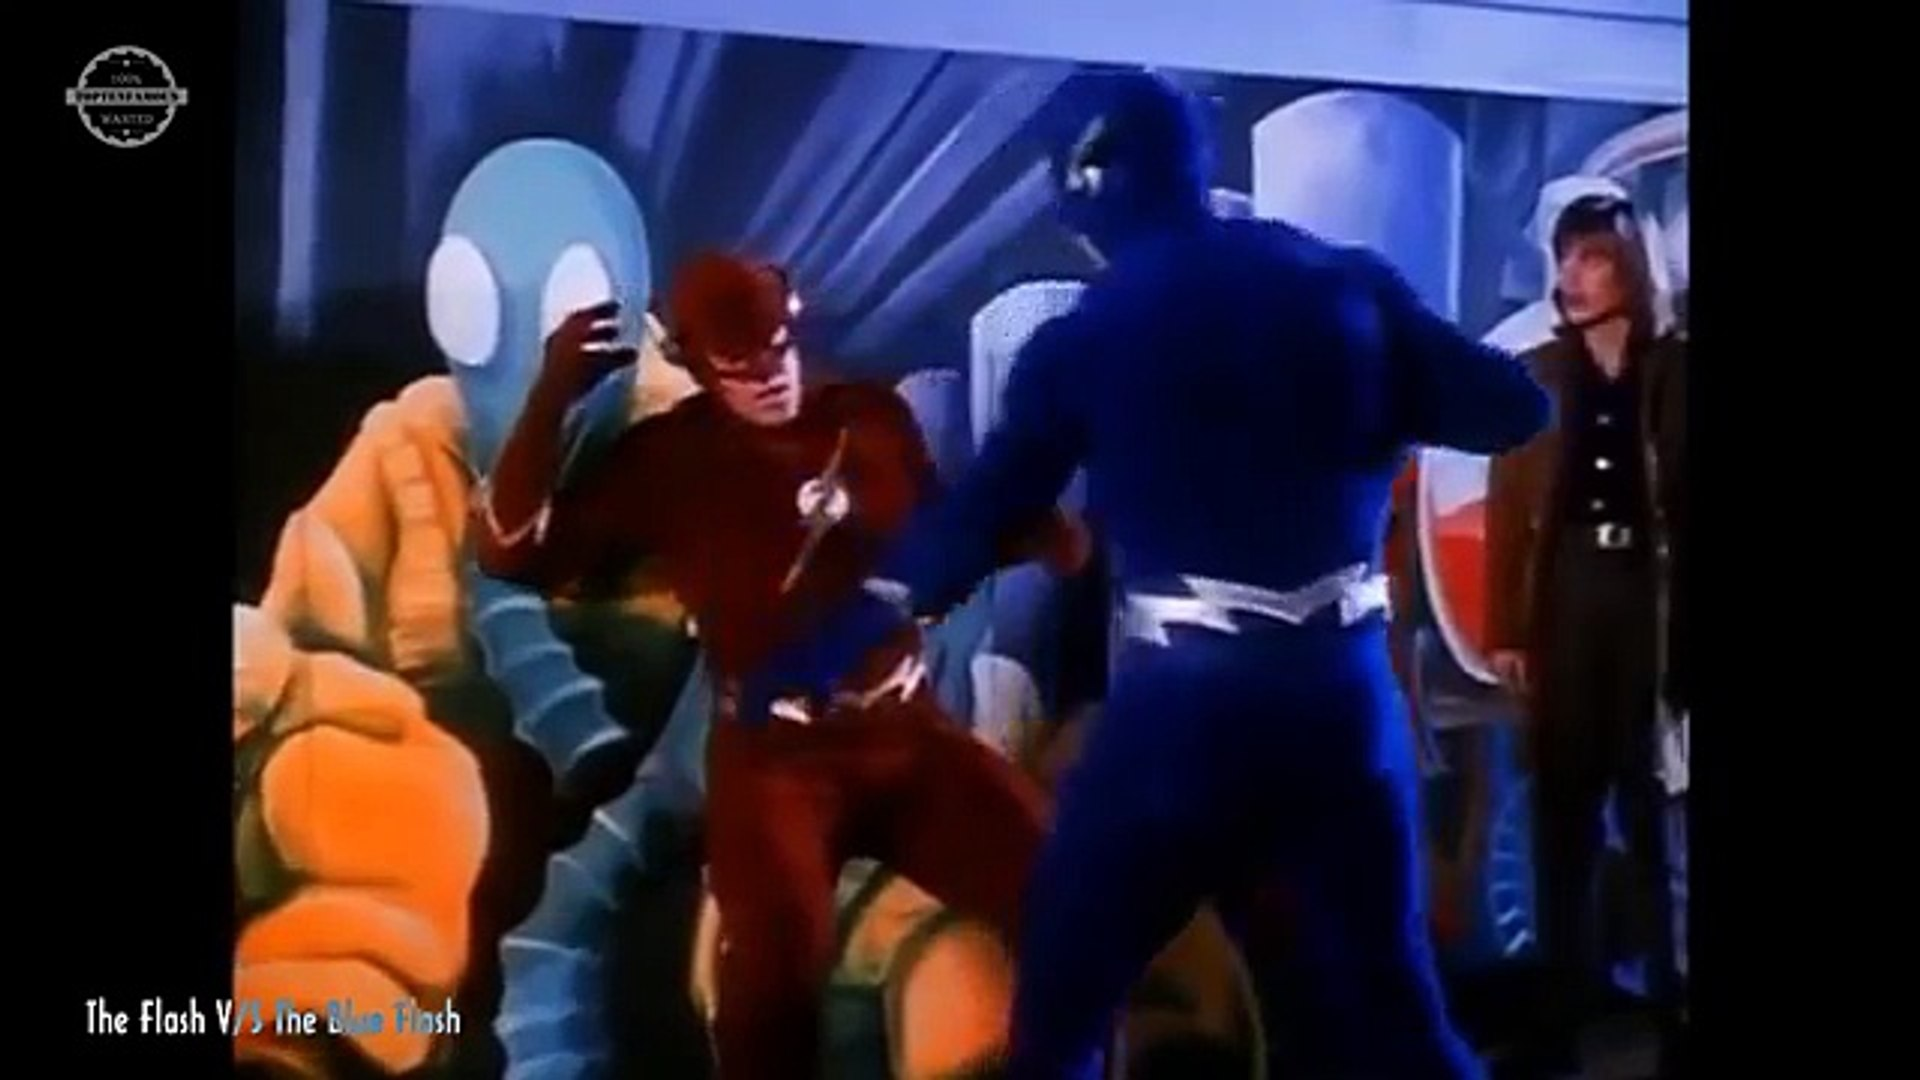 The Flash Vs Reverse Flash Savitar Blue Flash Zoom Whos The